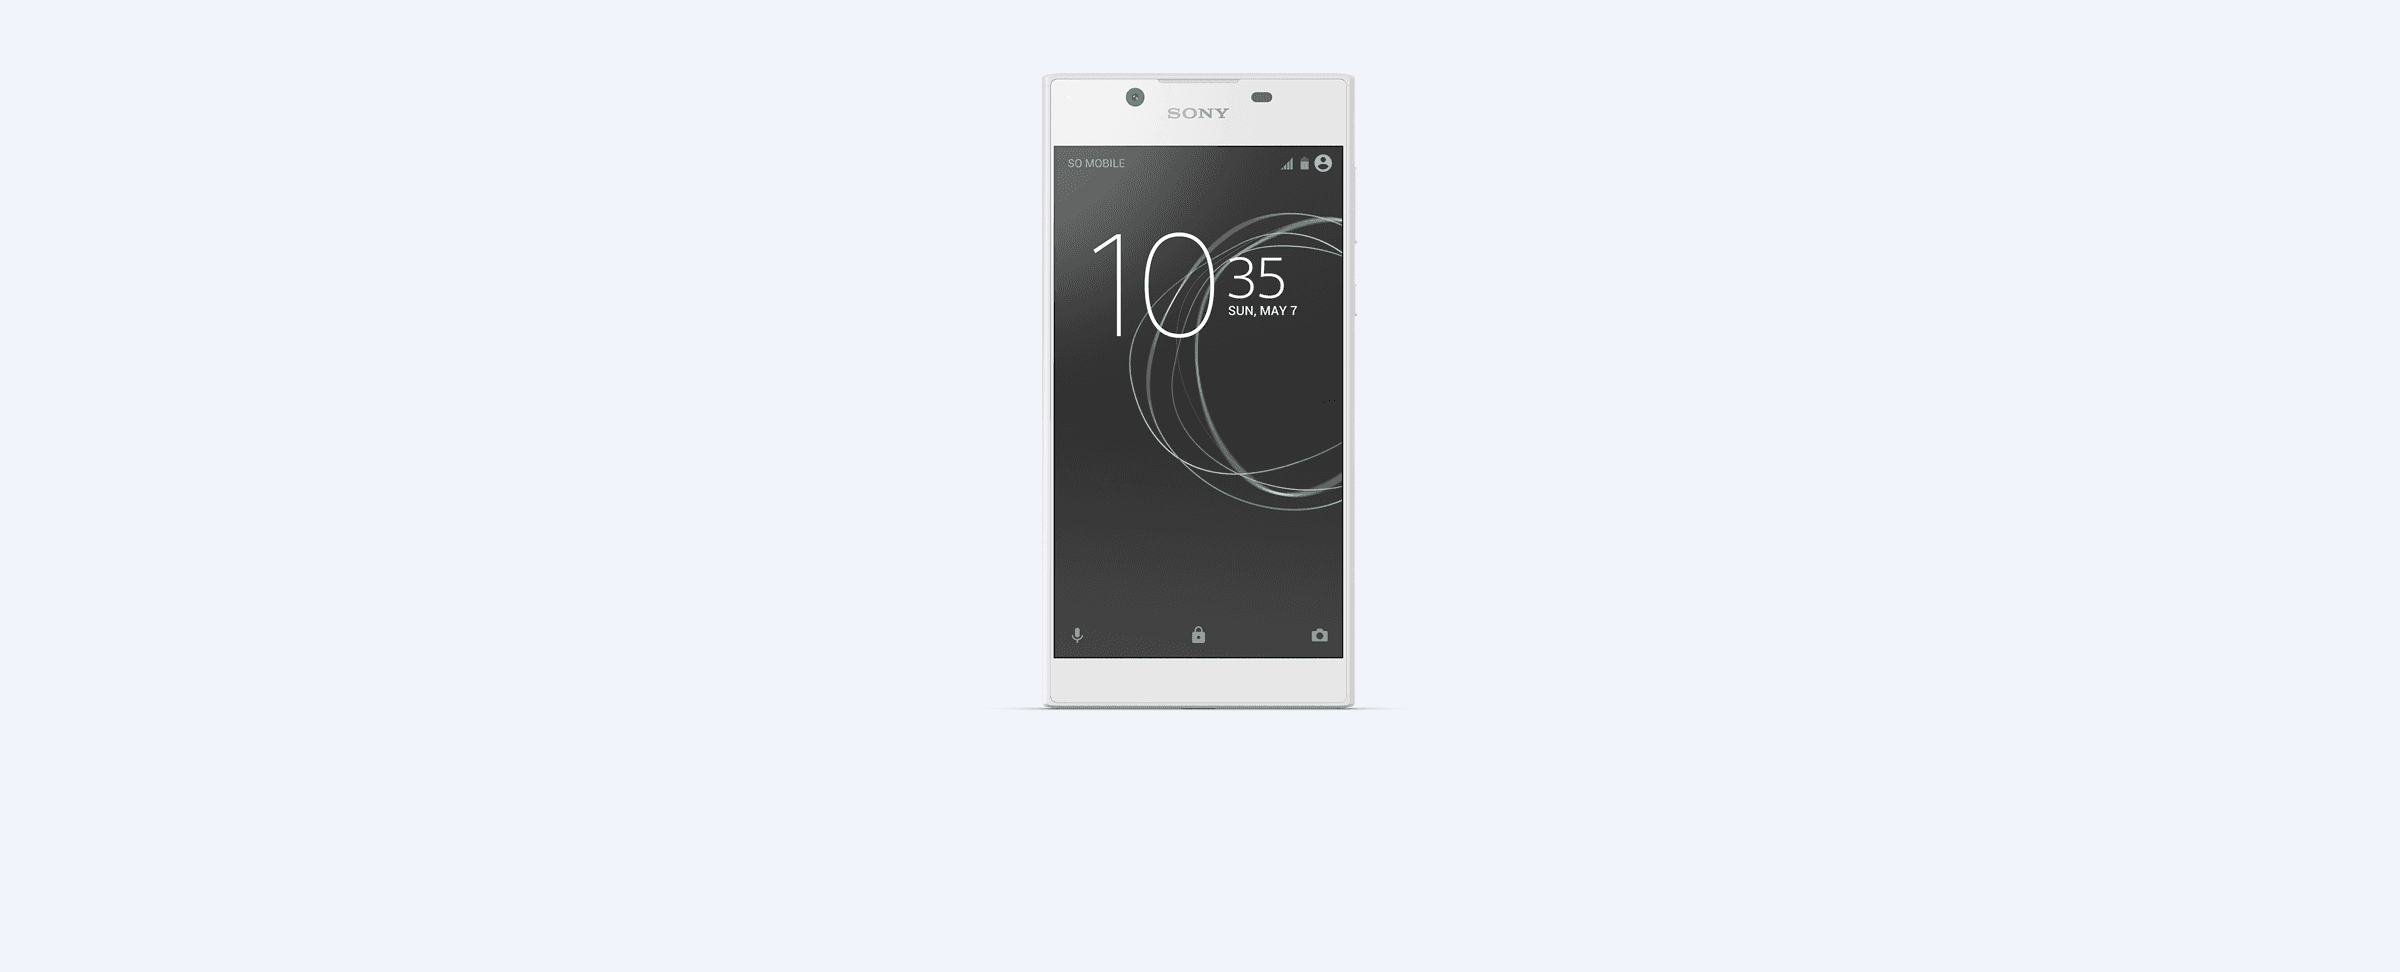 Sony Xperia L1 6